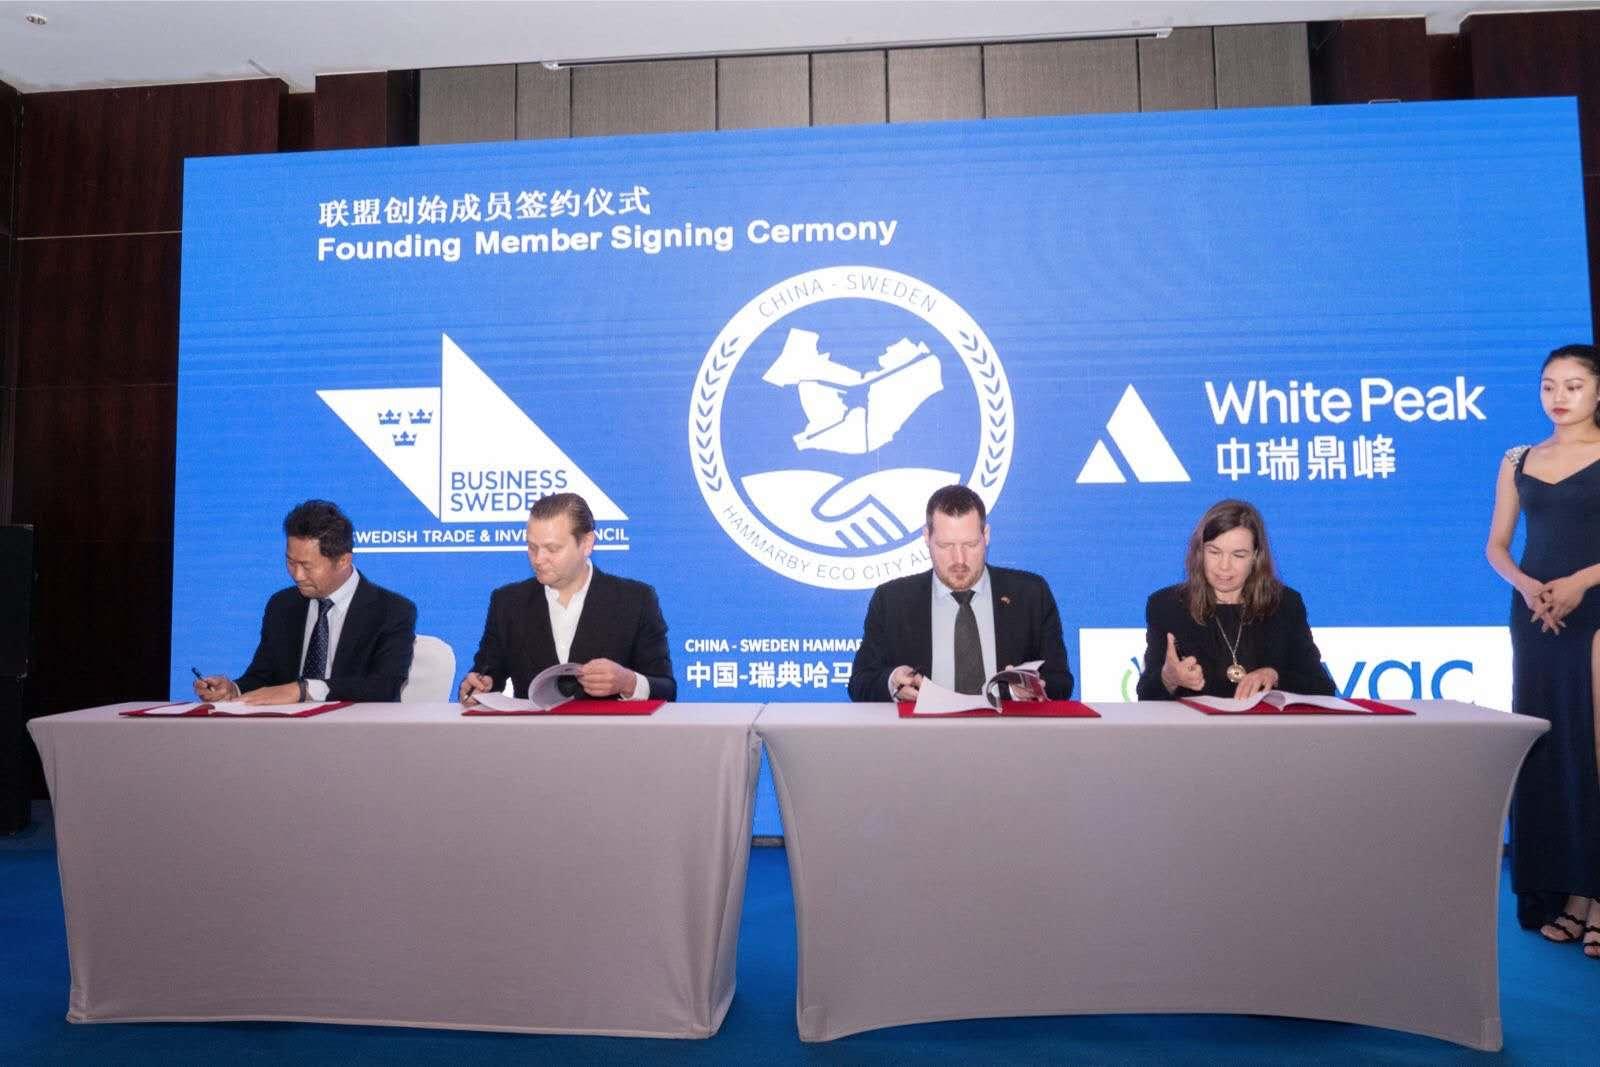 Alliance established to bring green Swedish urbanization solutions to China